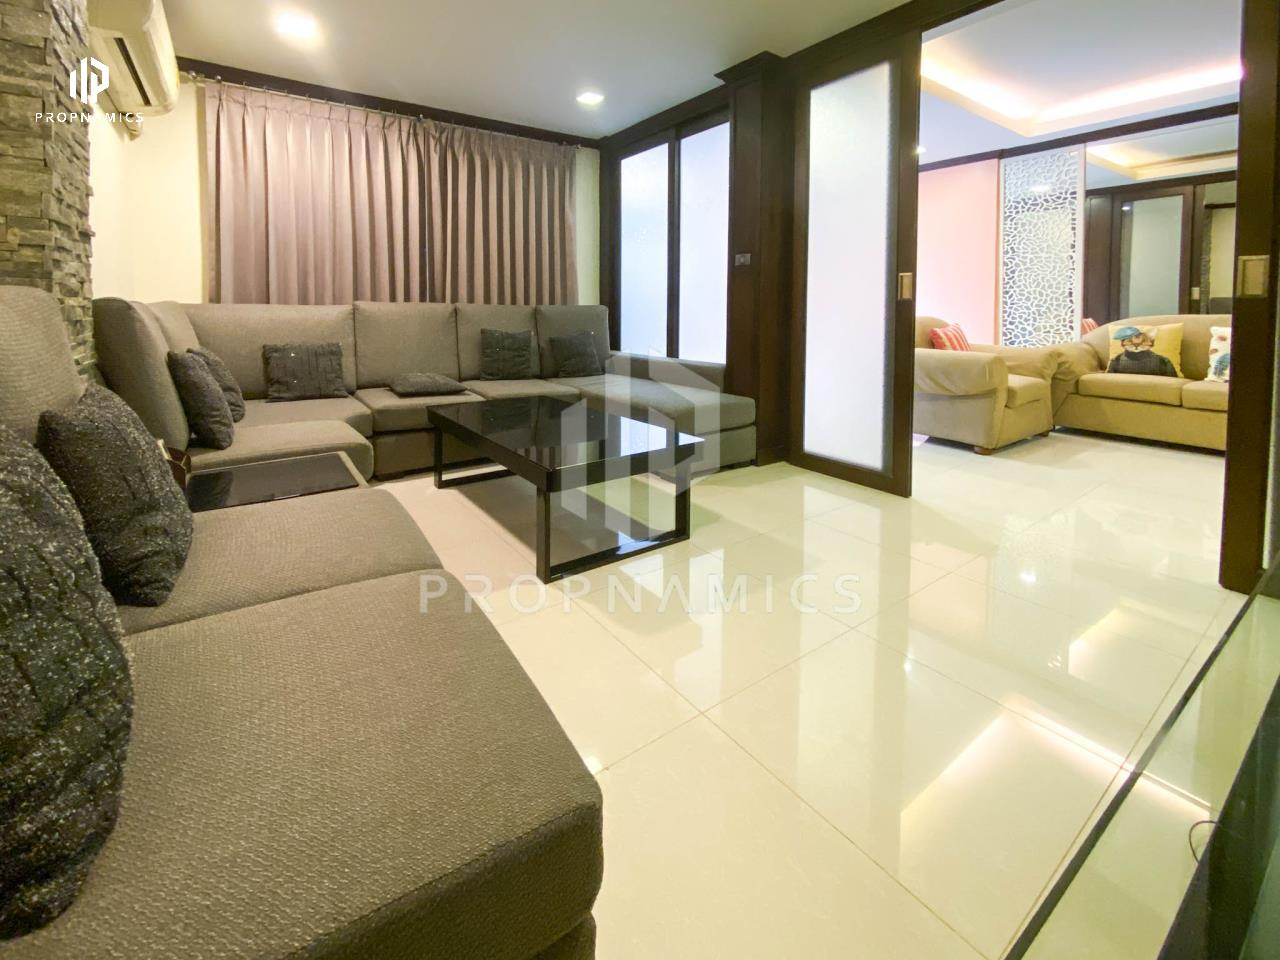 Propnamics Co., Ltd Agency's FOR RENT: SINGLE HOUSE IN SUKHUMVIT 26 5